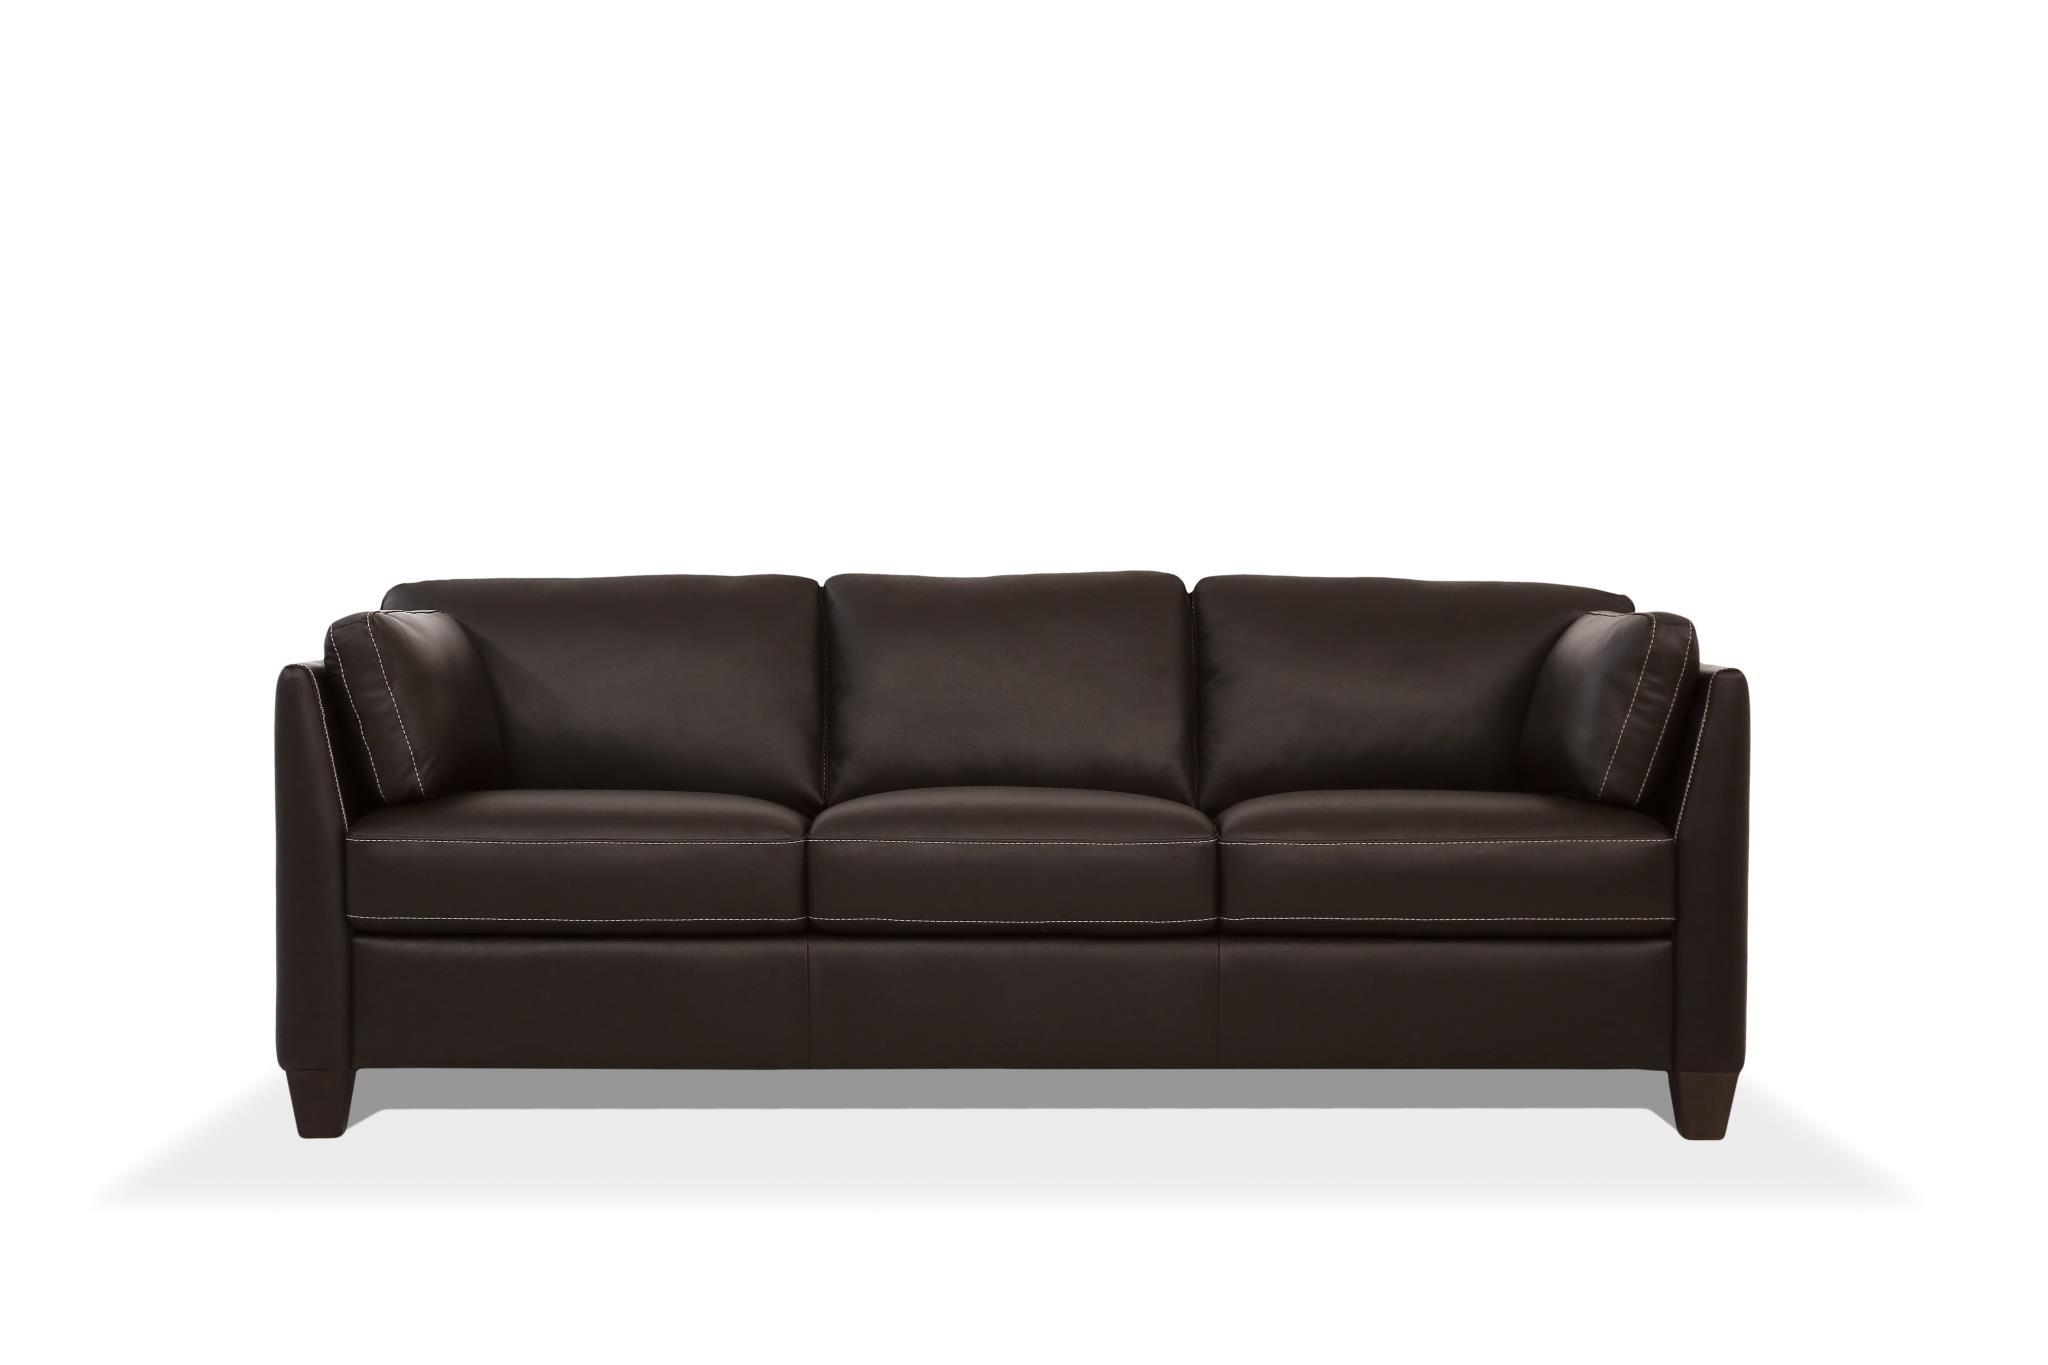 Chocolate Sofa Front